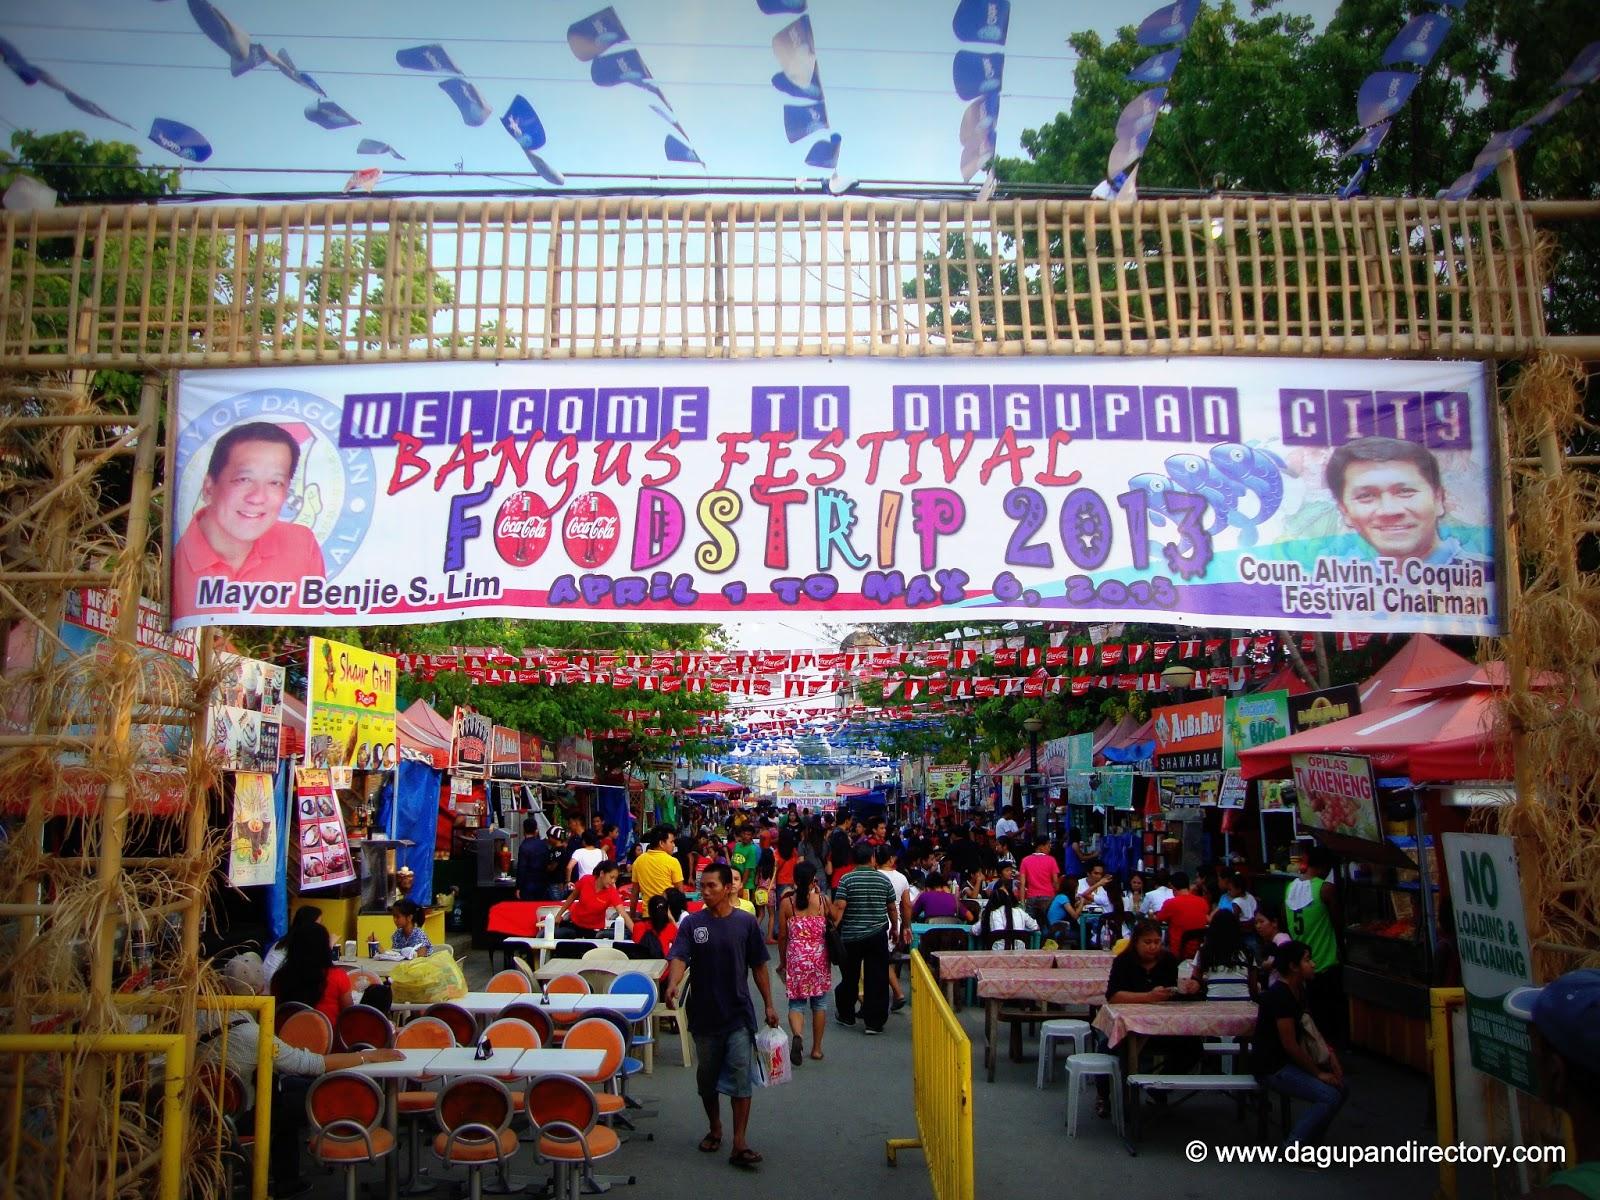 Dagupan City Bangus Festival Foodstrip 2013